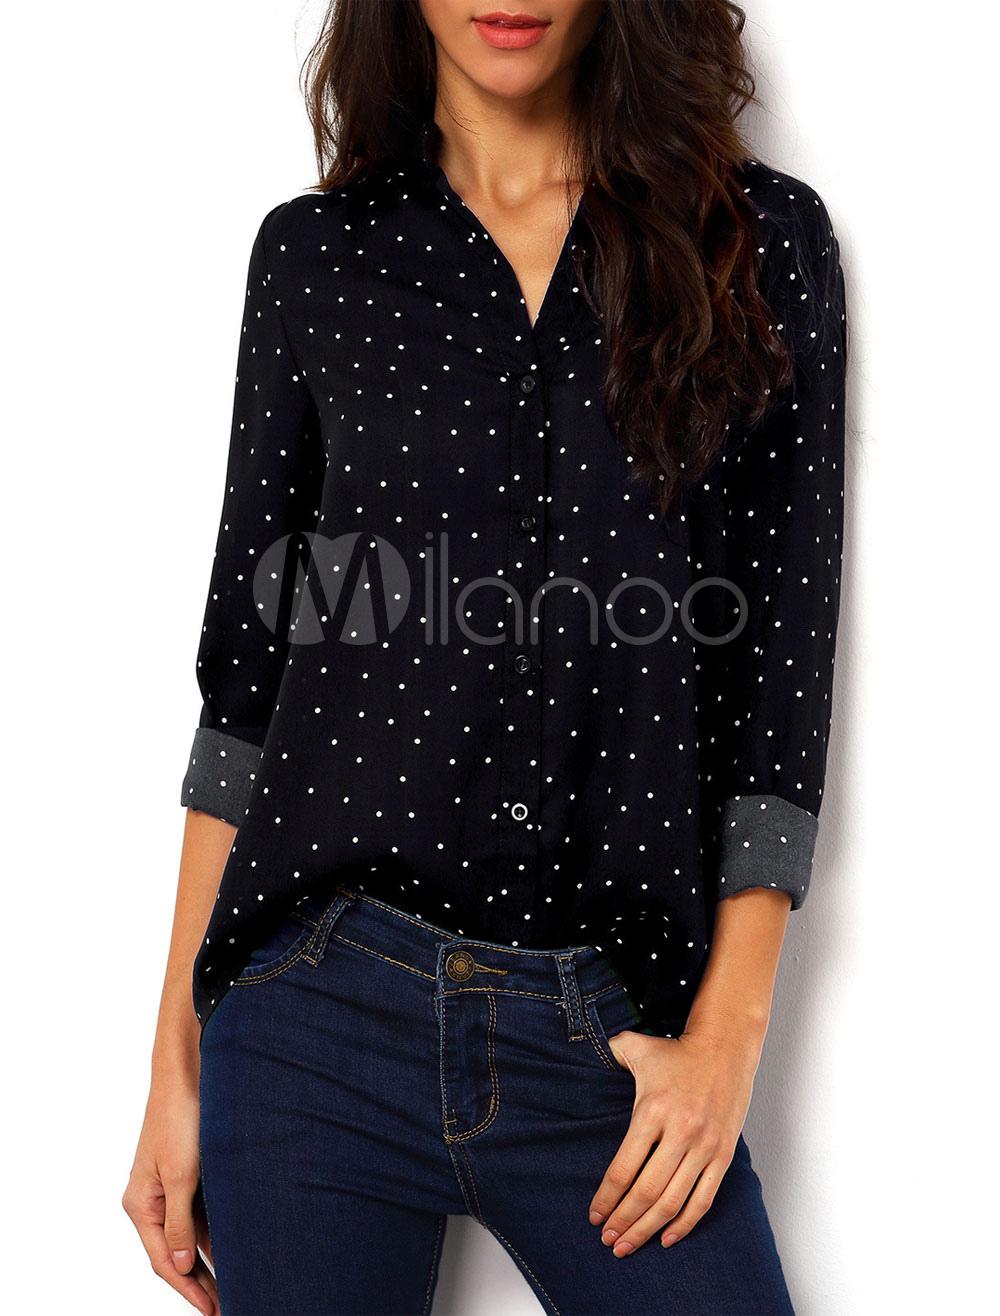 Vintaga Style Black Shirt Polka Dot Chiffon Casual Shirt